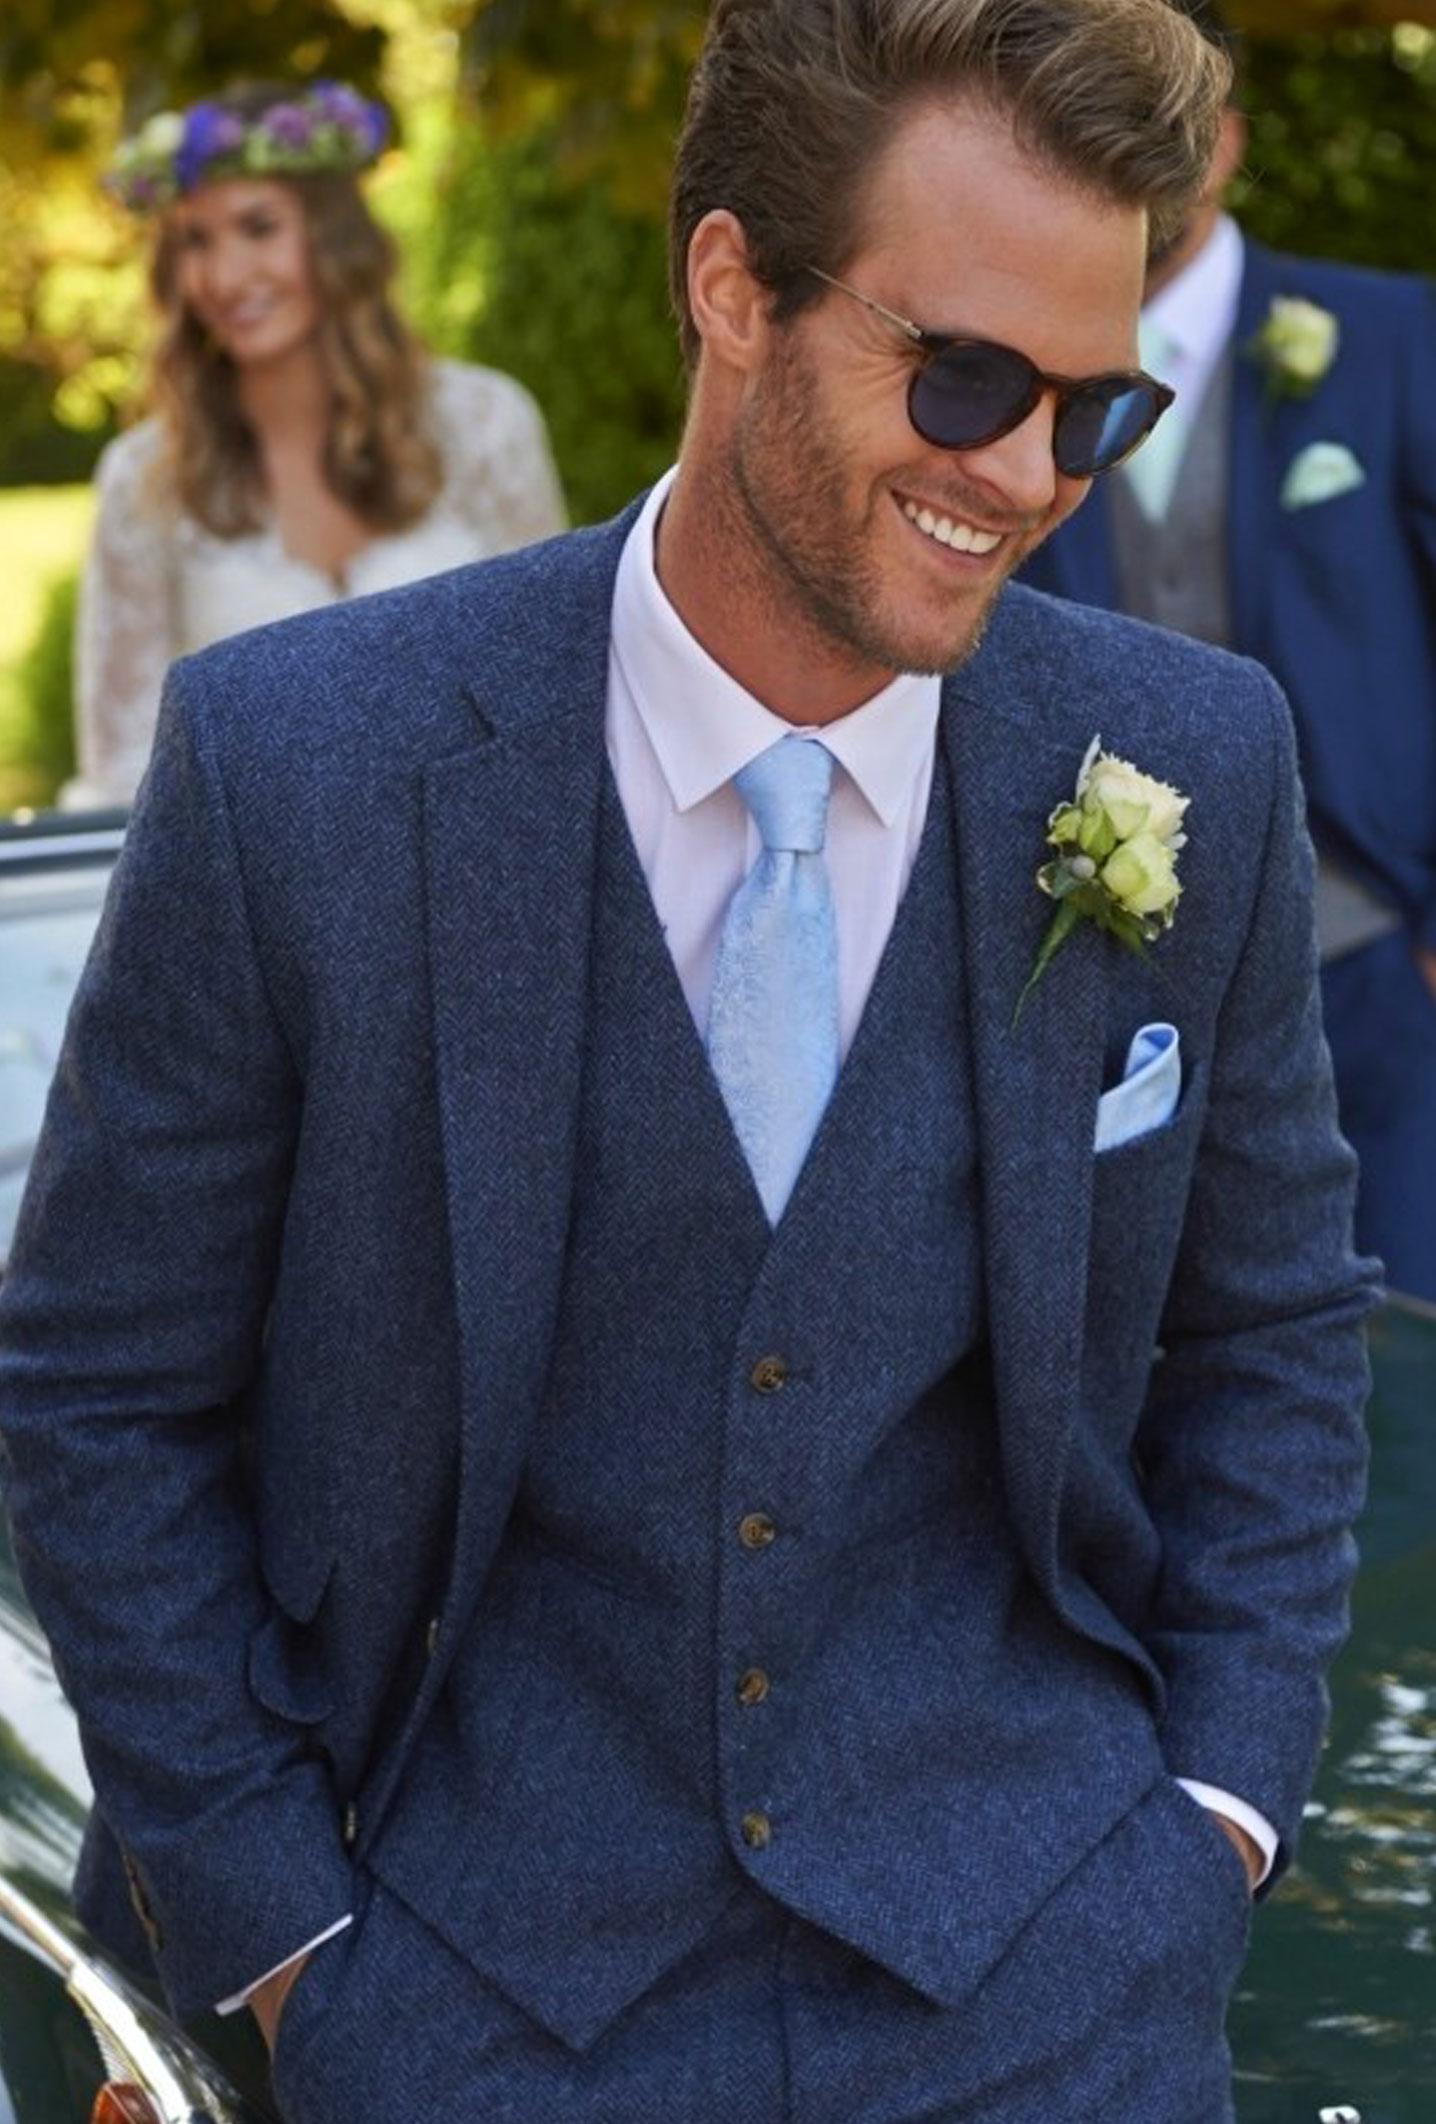 Shrewsbury wedding suit hire